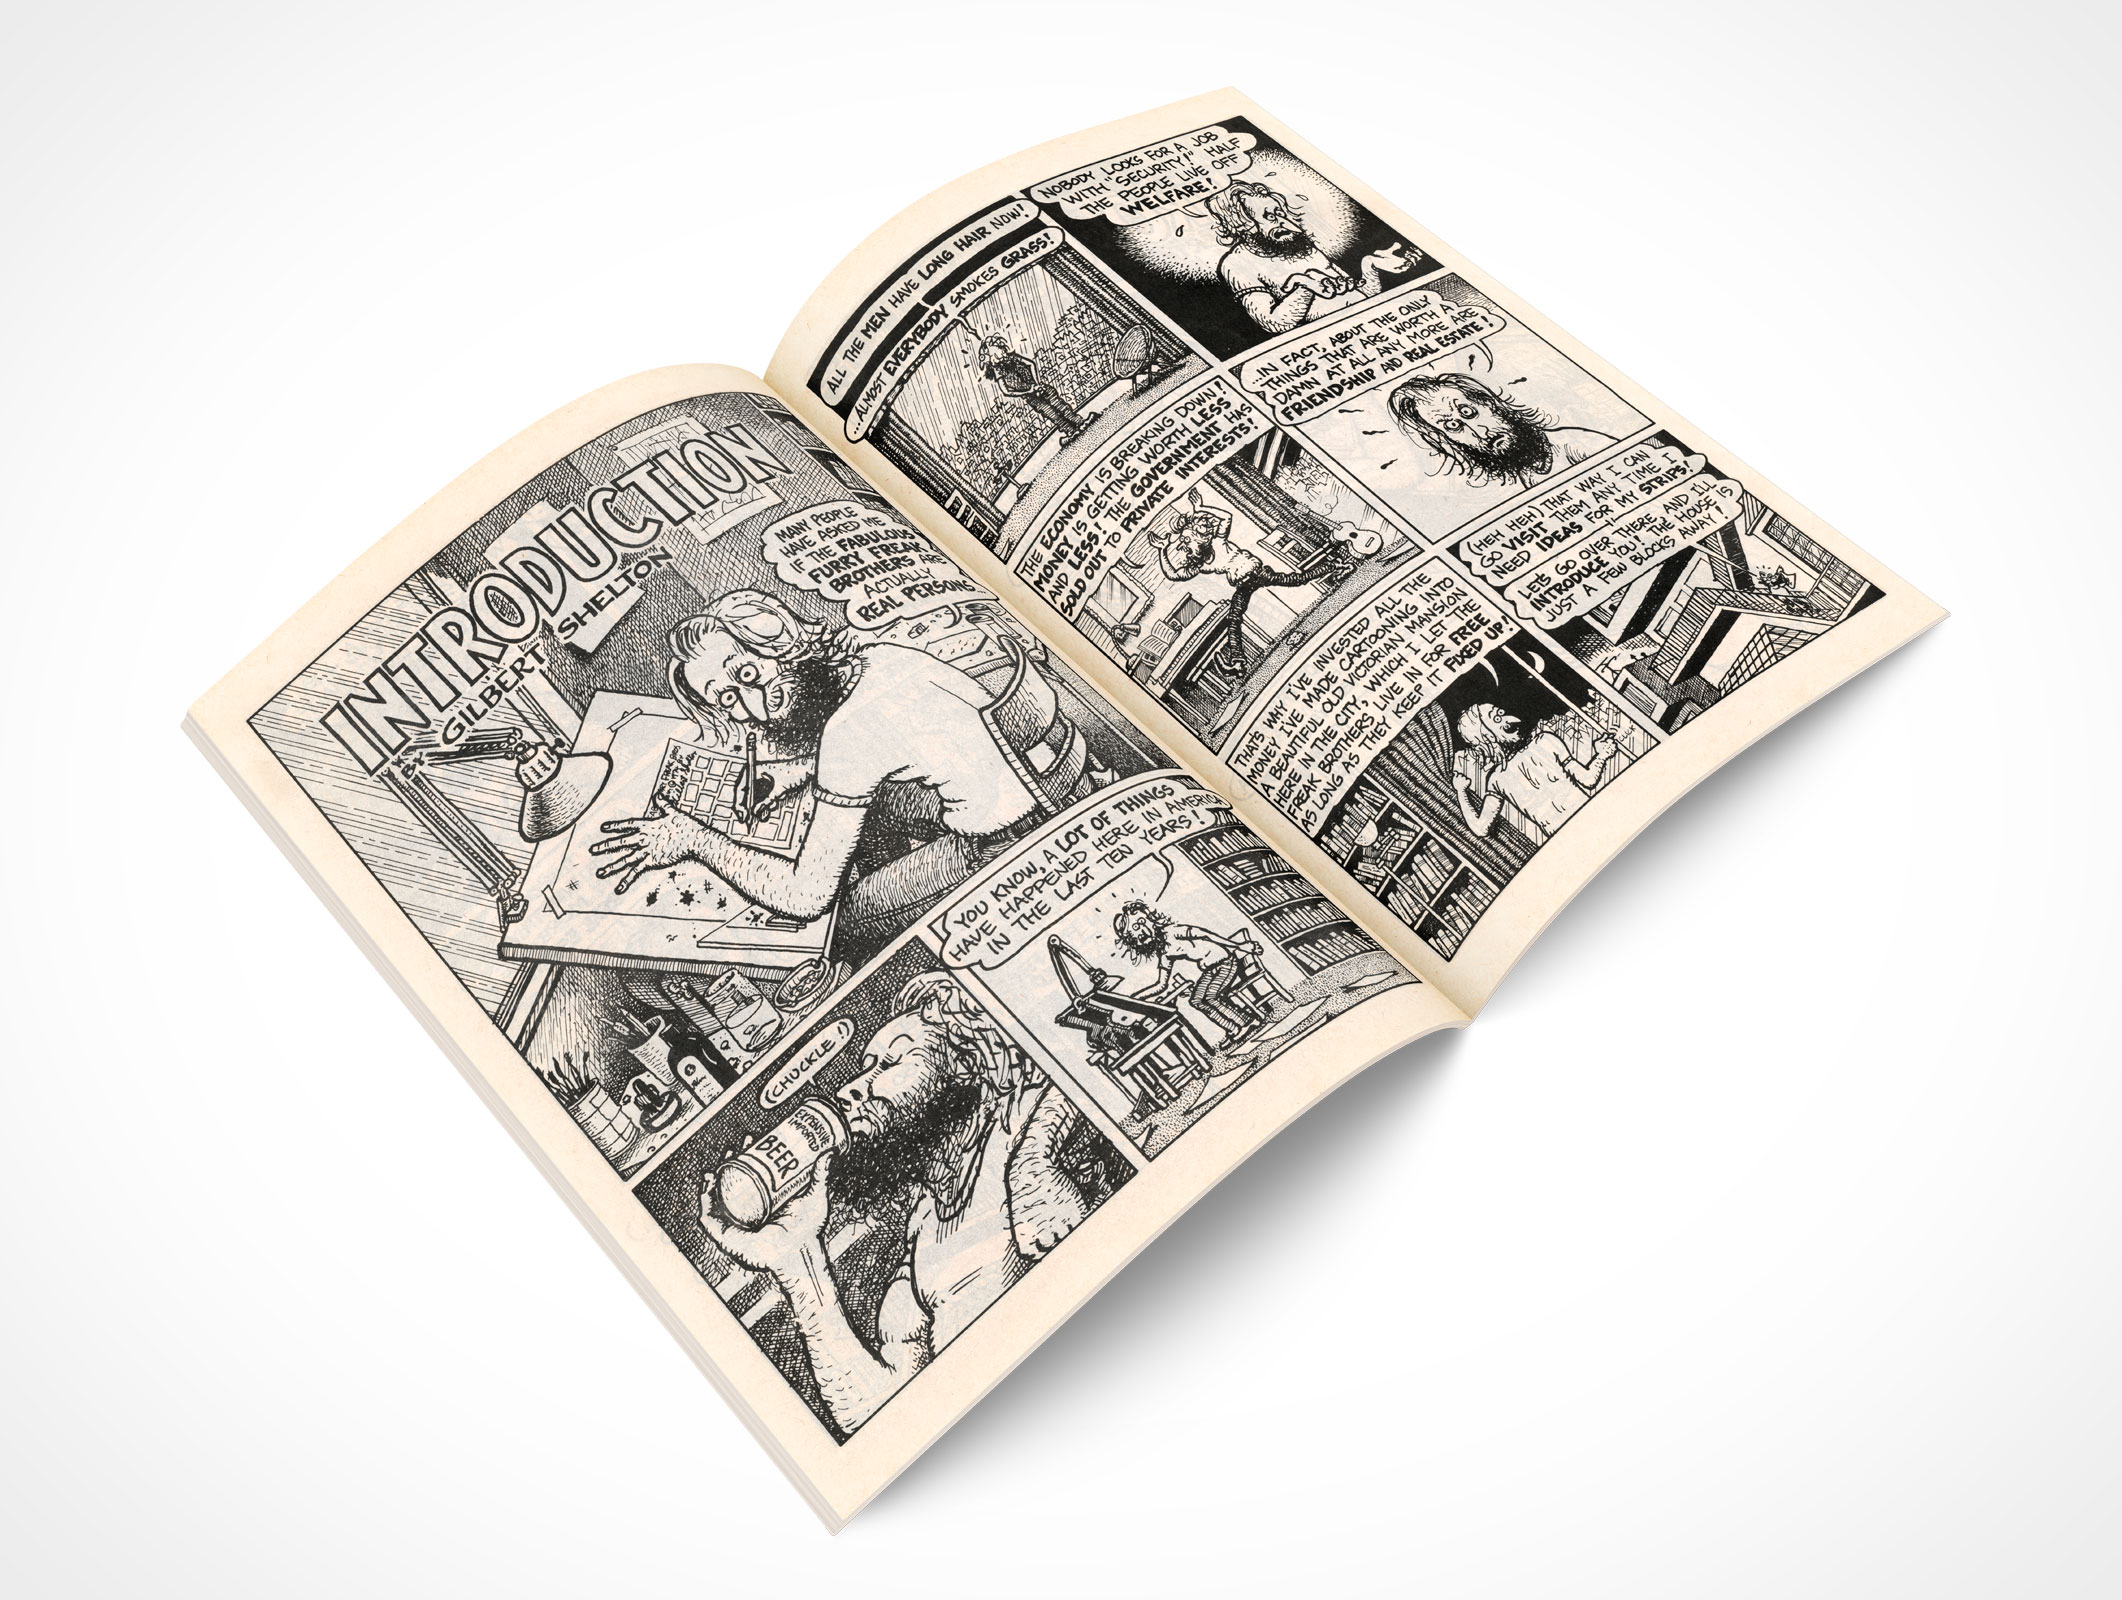 COMICBOOK012r2